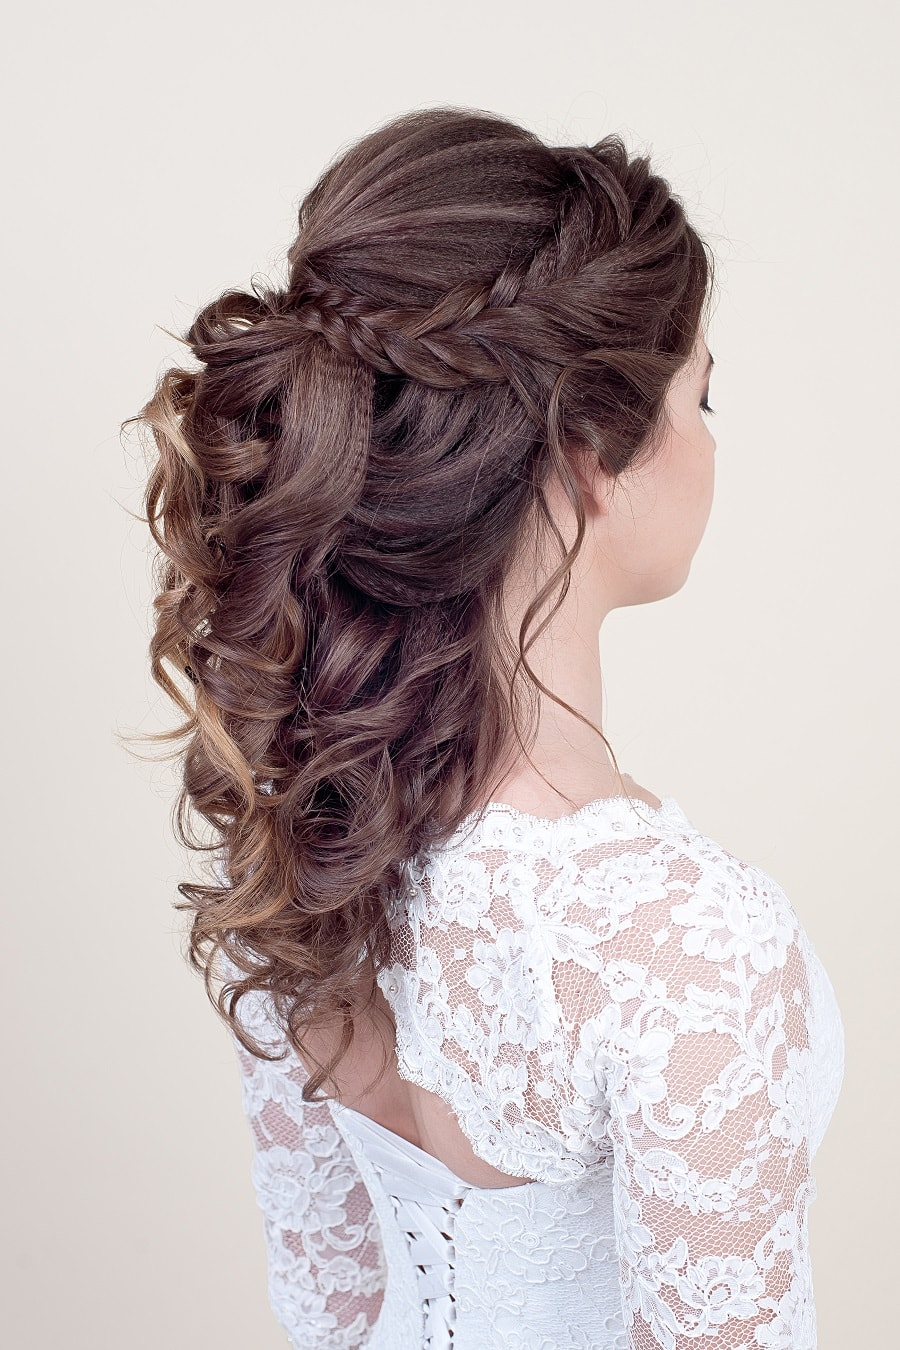 half up half down wedding hairstyle with braids